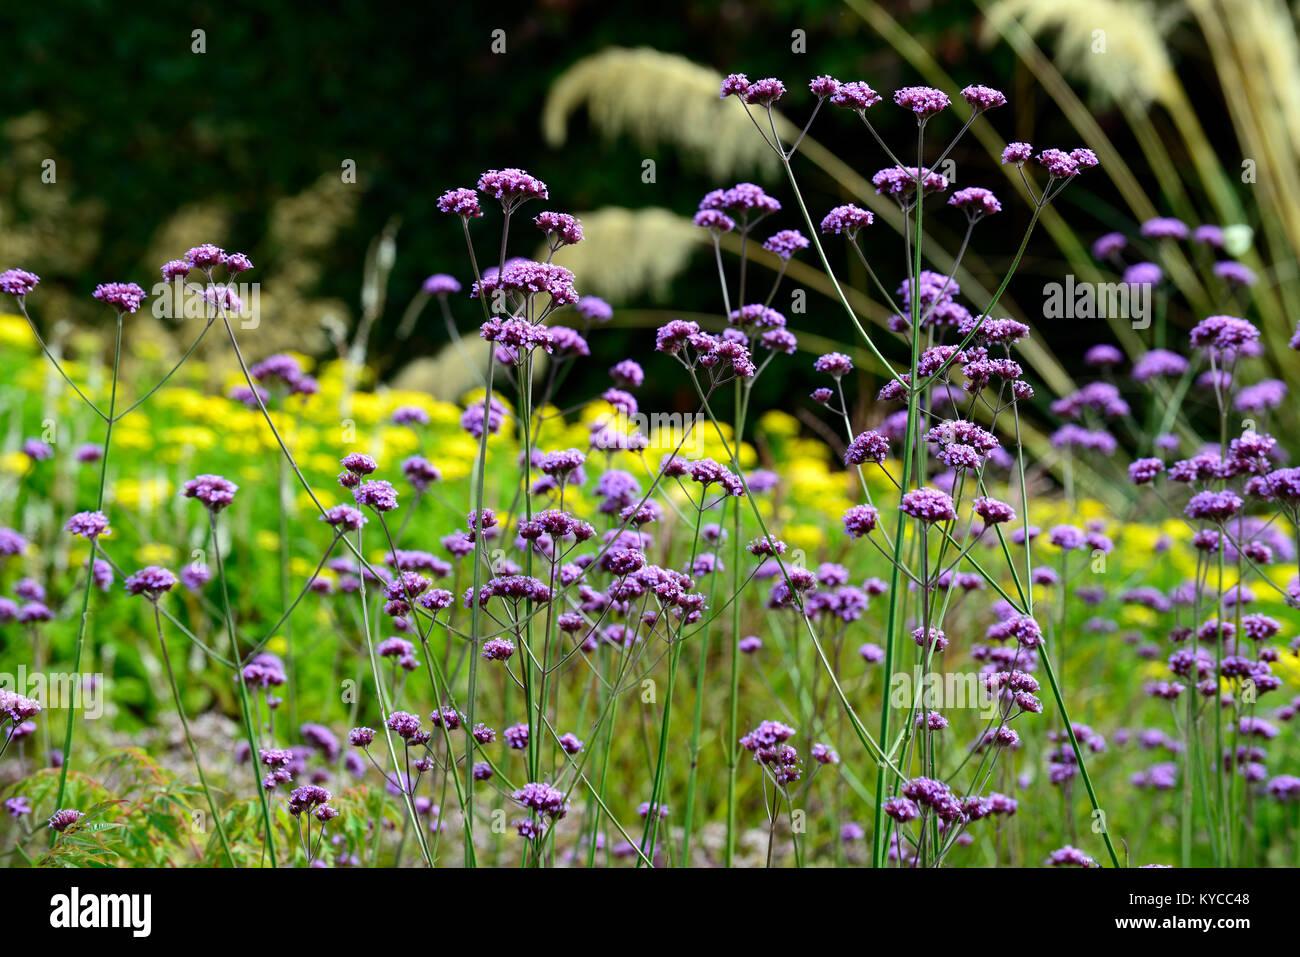 Verbena Bonariensistall Perennial Purple Flower Flowers Mixed